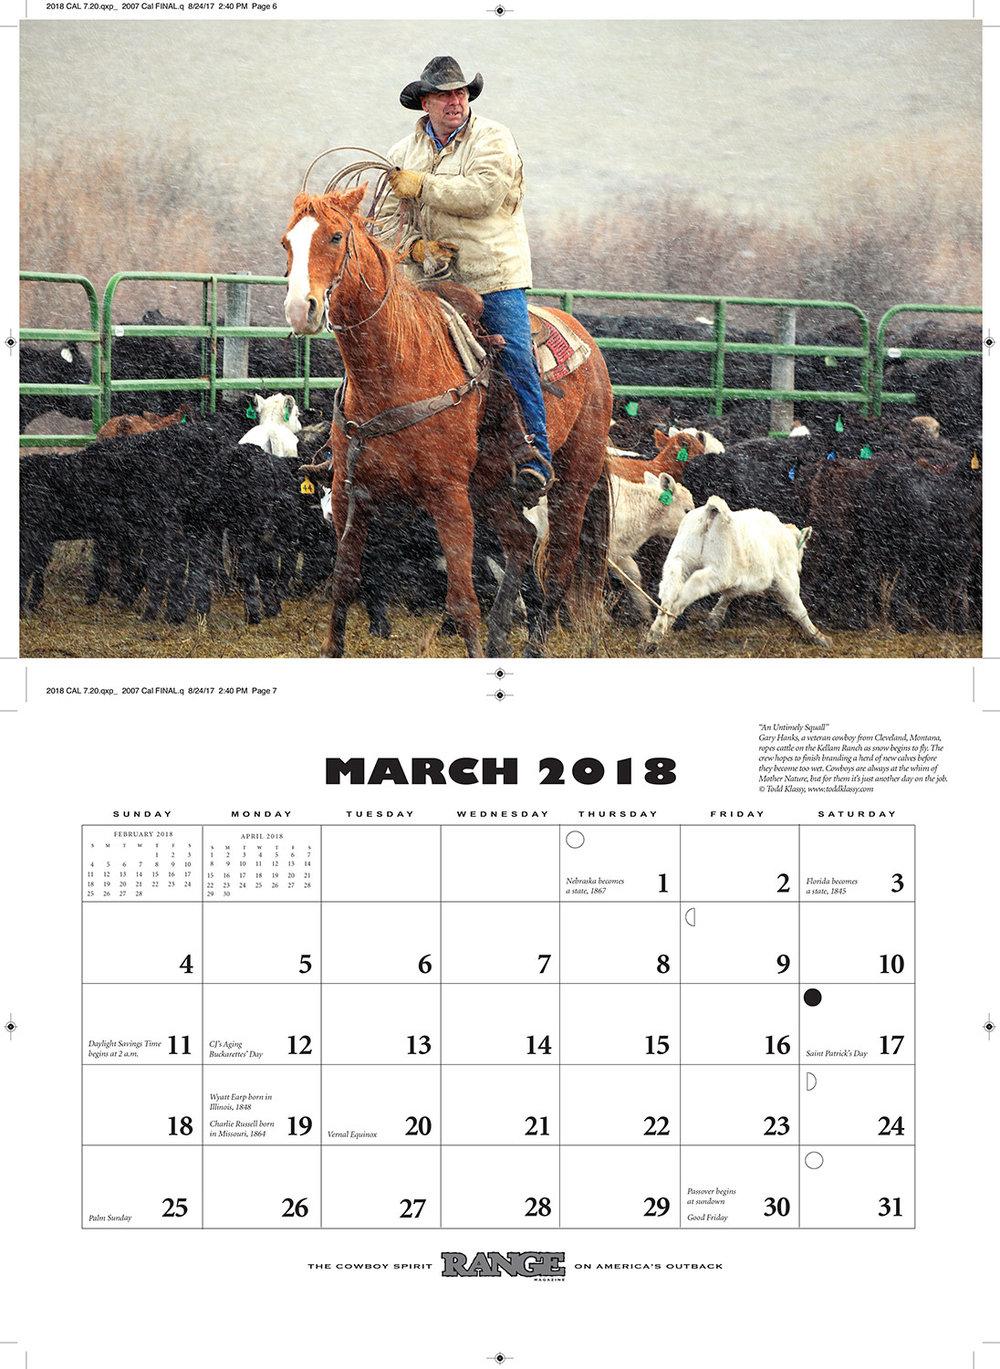 Range-Magazine-2018-Calendar-March-20170824-Small.jpg